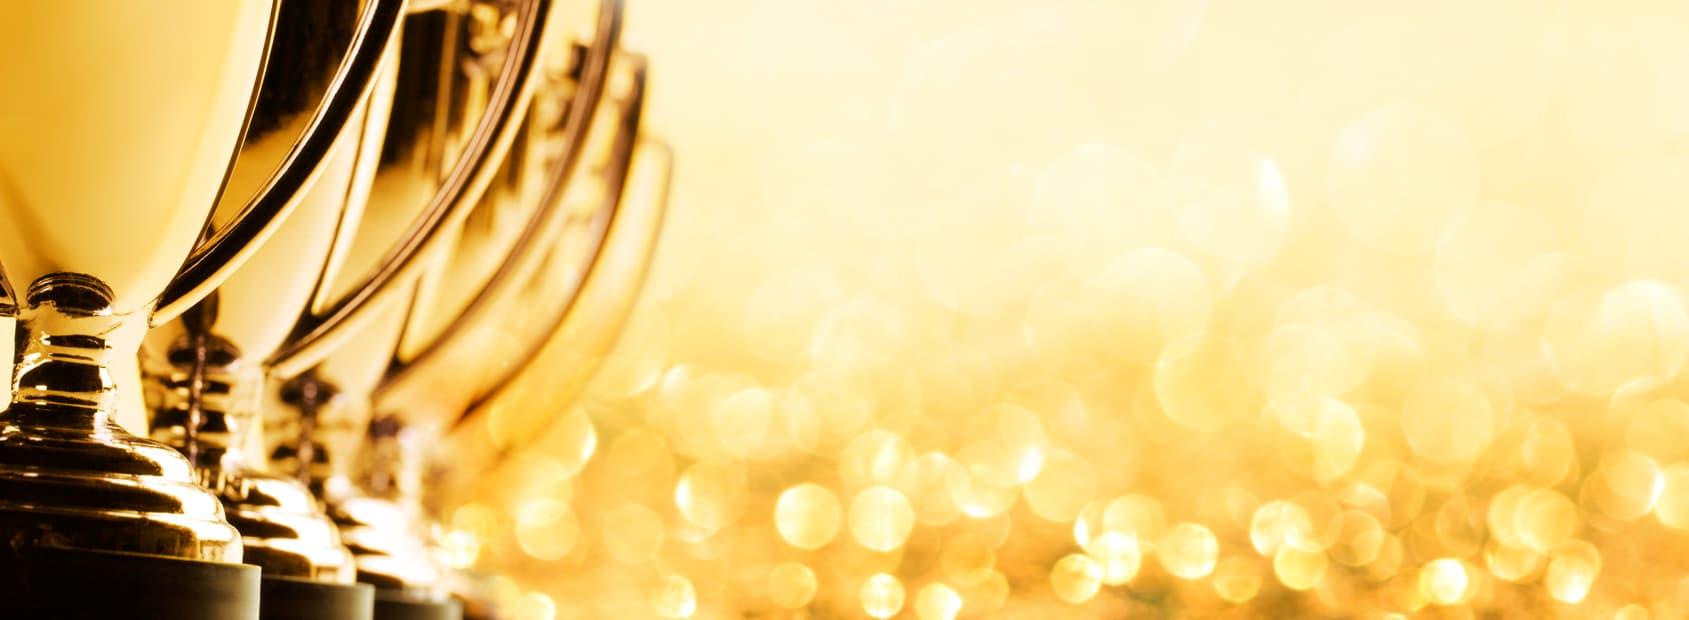 BerniePortal Named Top 20 Performance Management Software